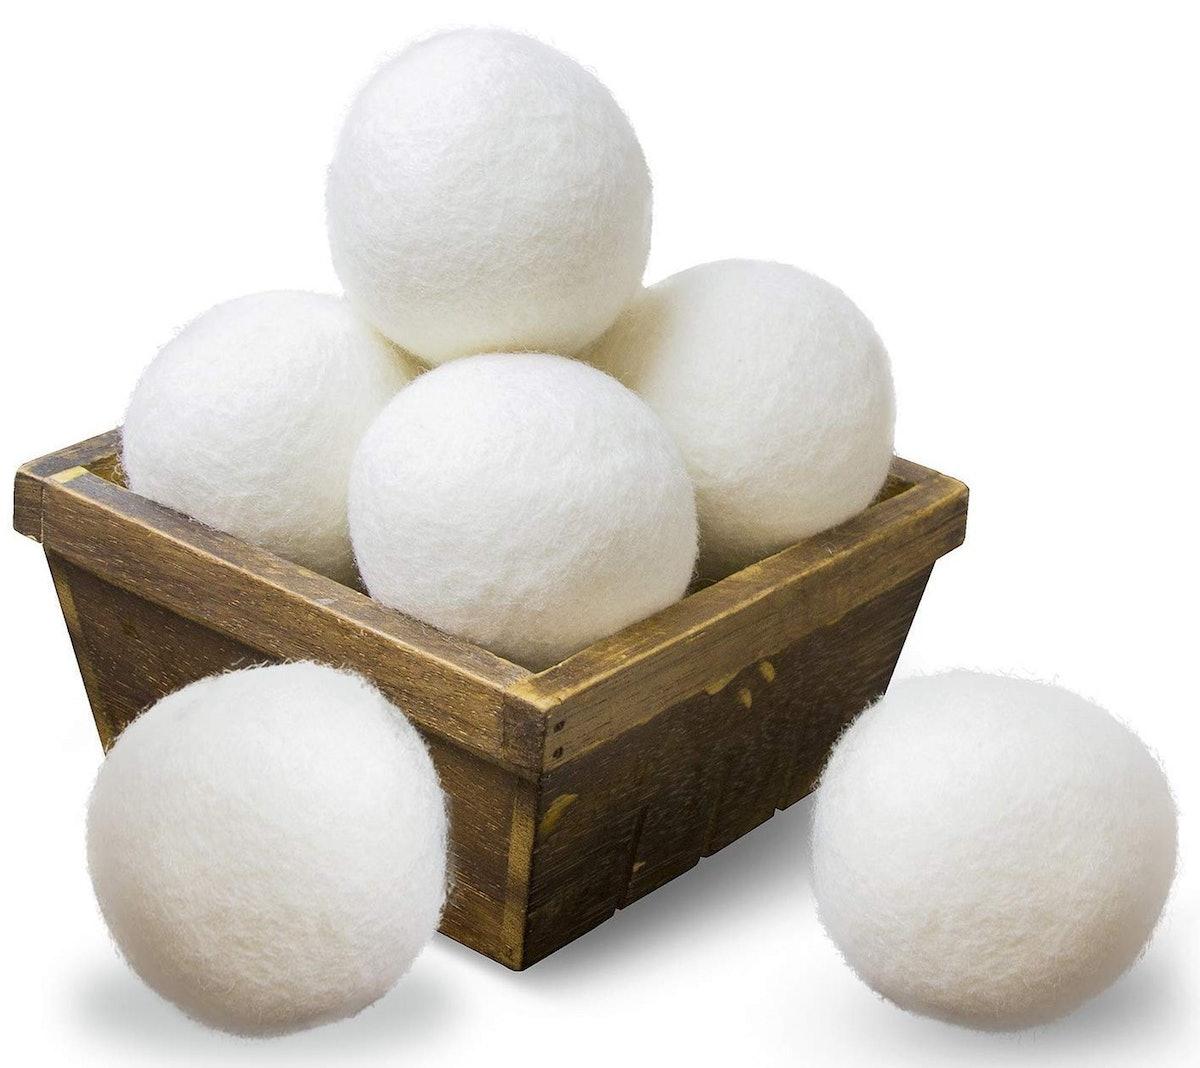 SnugPad Wool Dryer Balls (6 Pack)